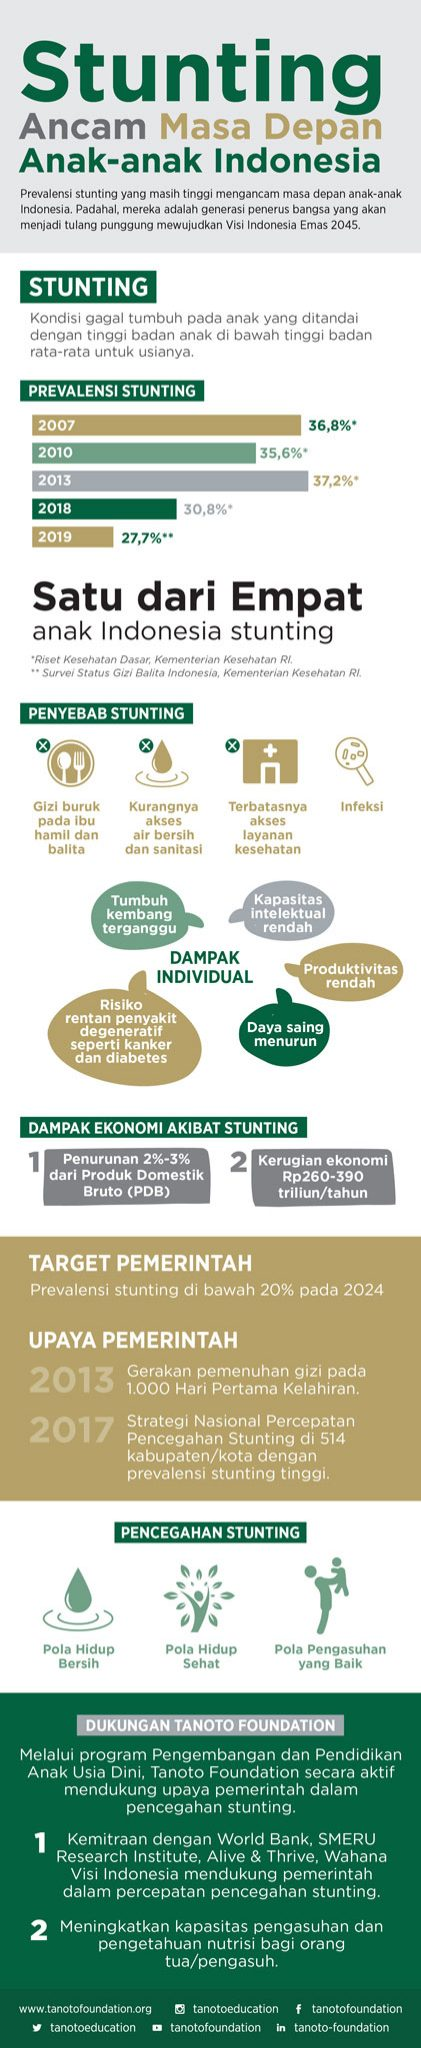 infografis stunting